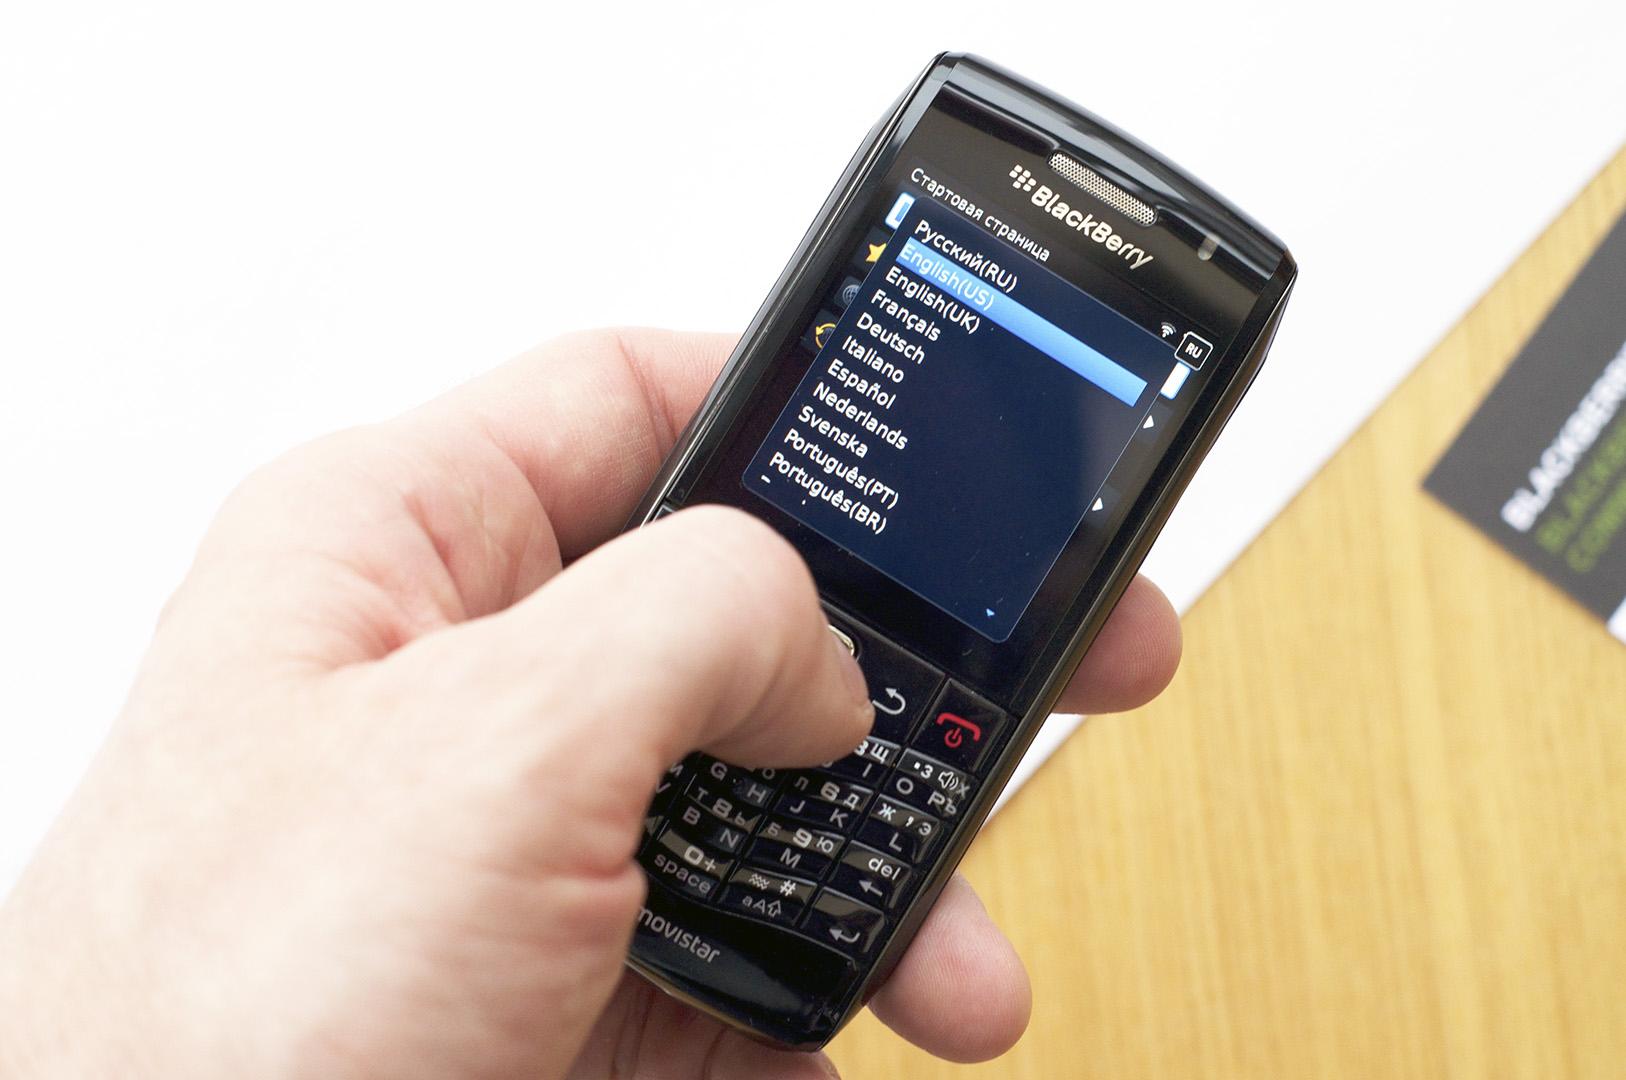 blackberry-9100-pearl-3g-16